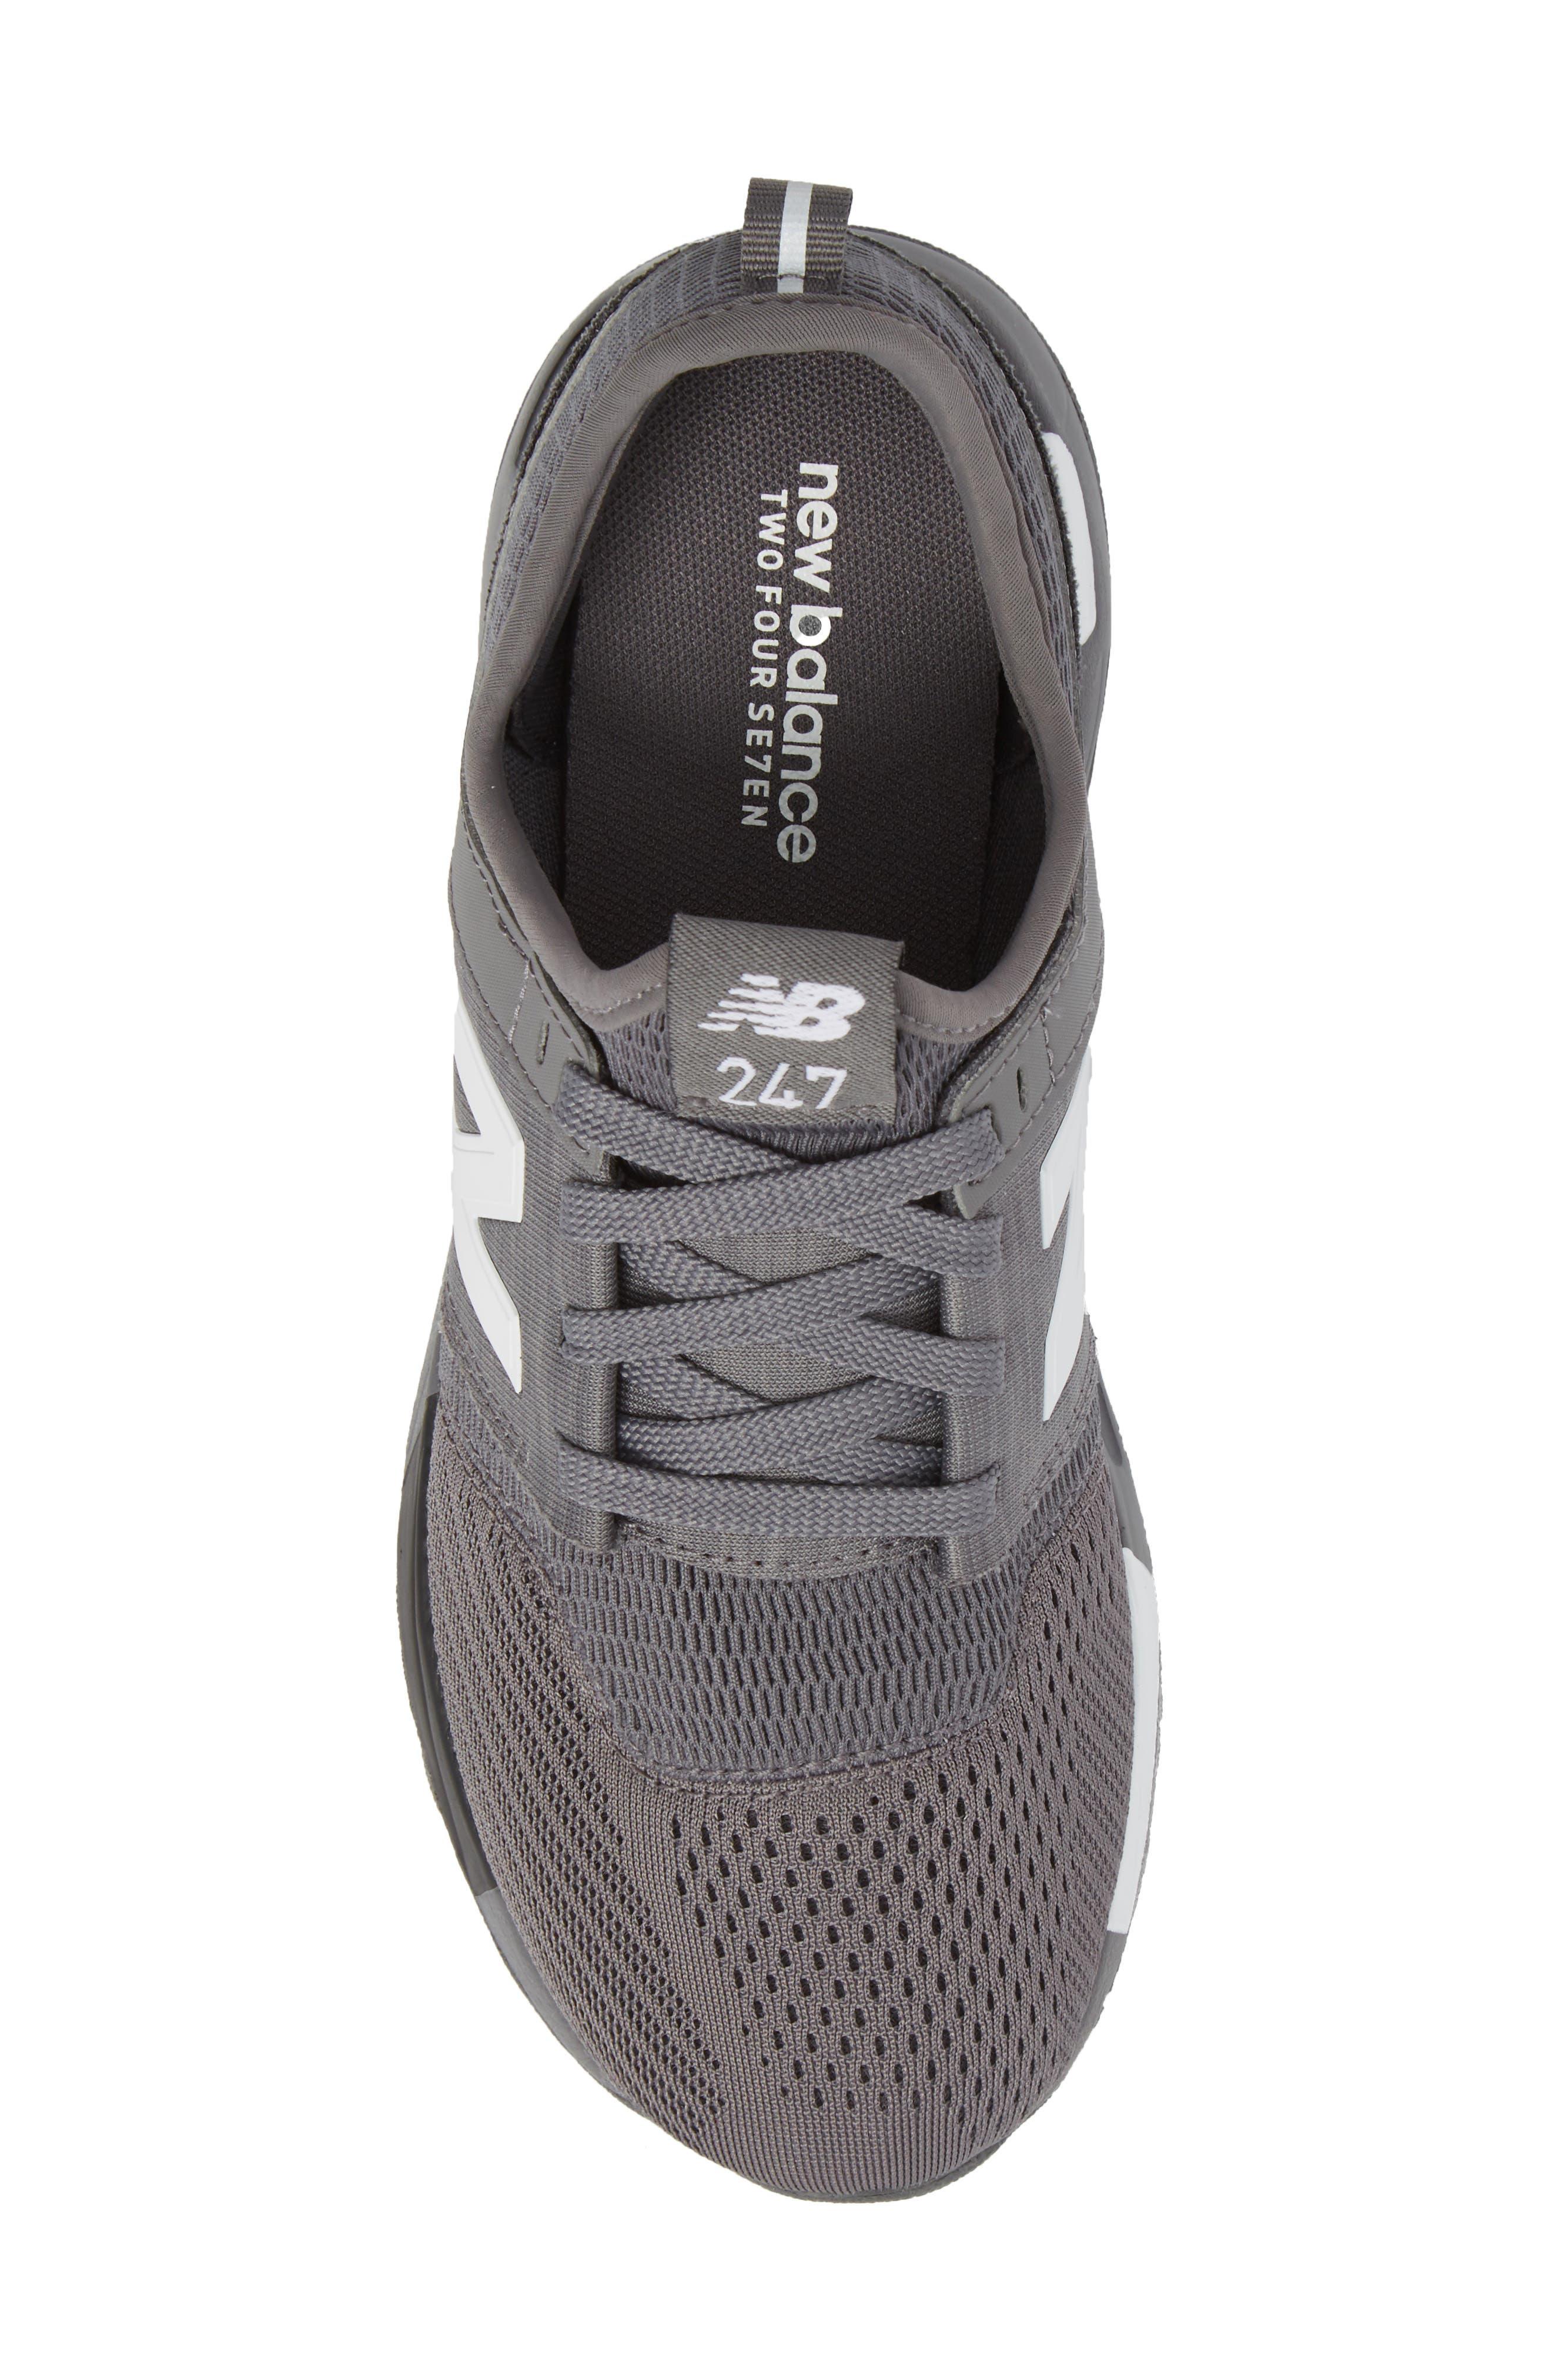 247 Sport Sneaker,                             Alternate thumbnail 5, color,                             Grey/ Black